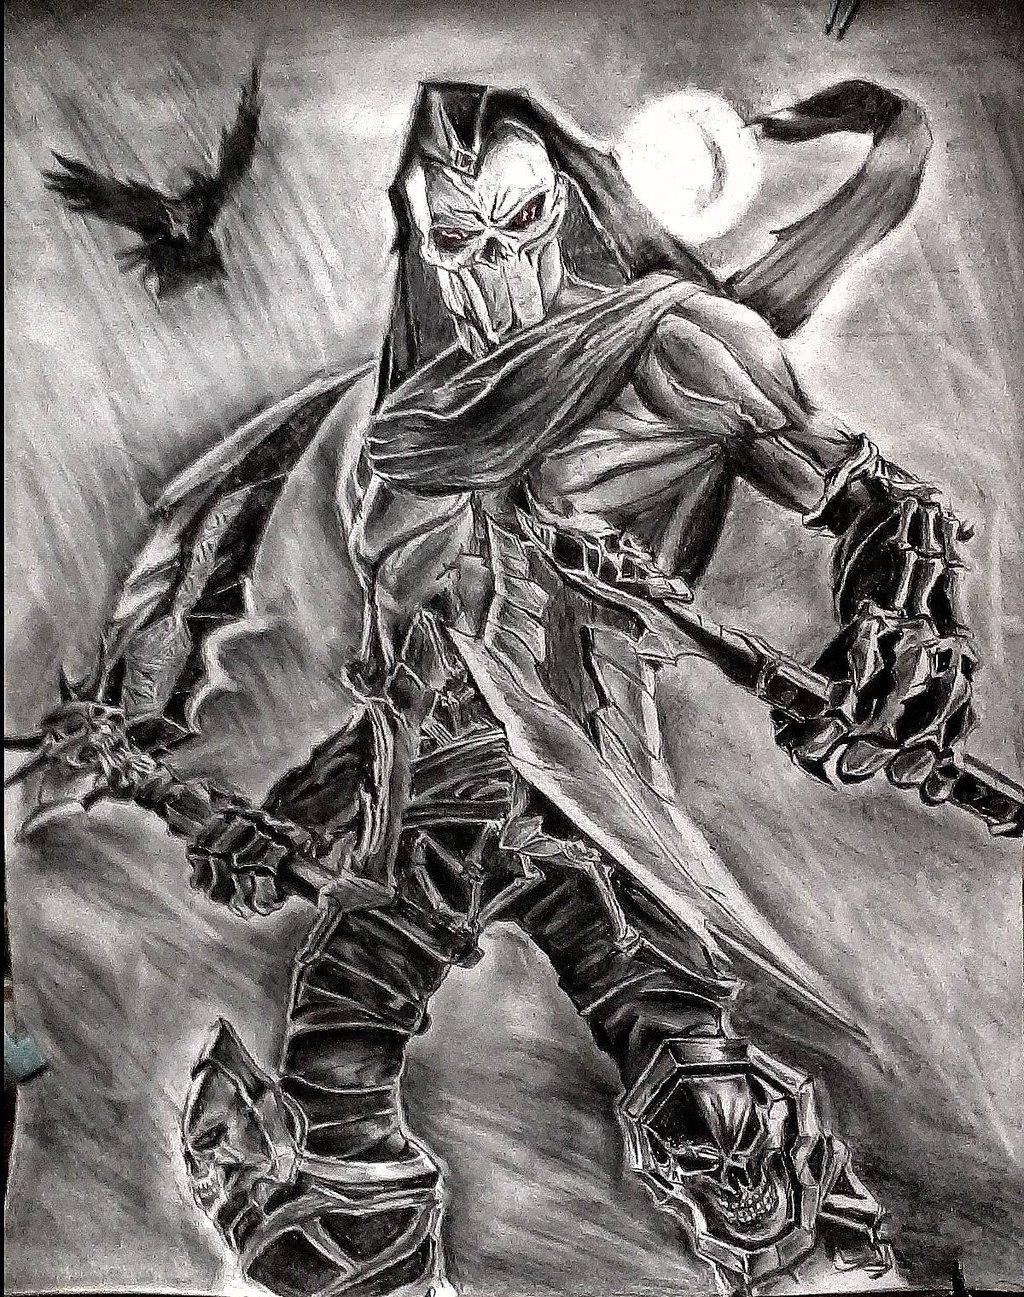 Drawn grim reaper death DEBOnation of Darksiders Grim by